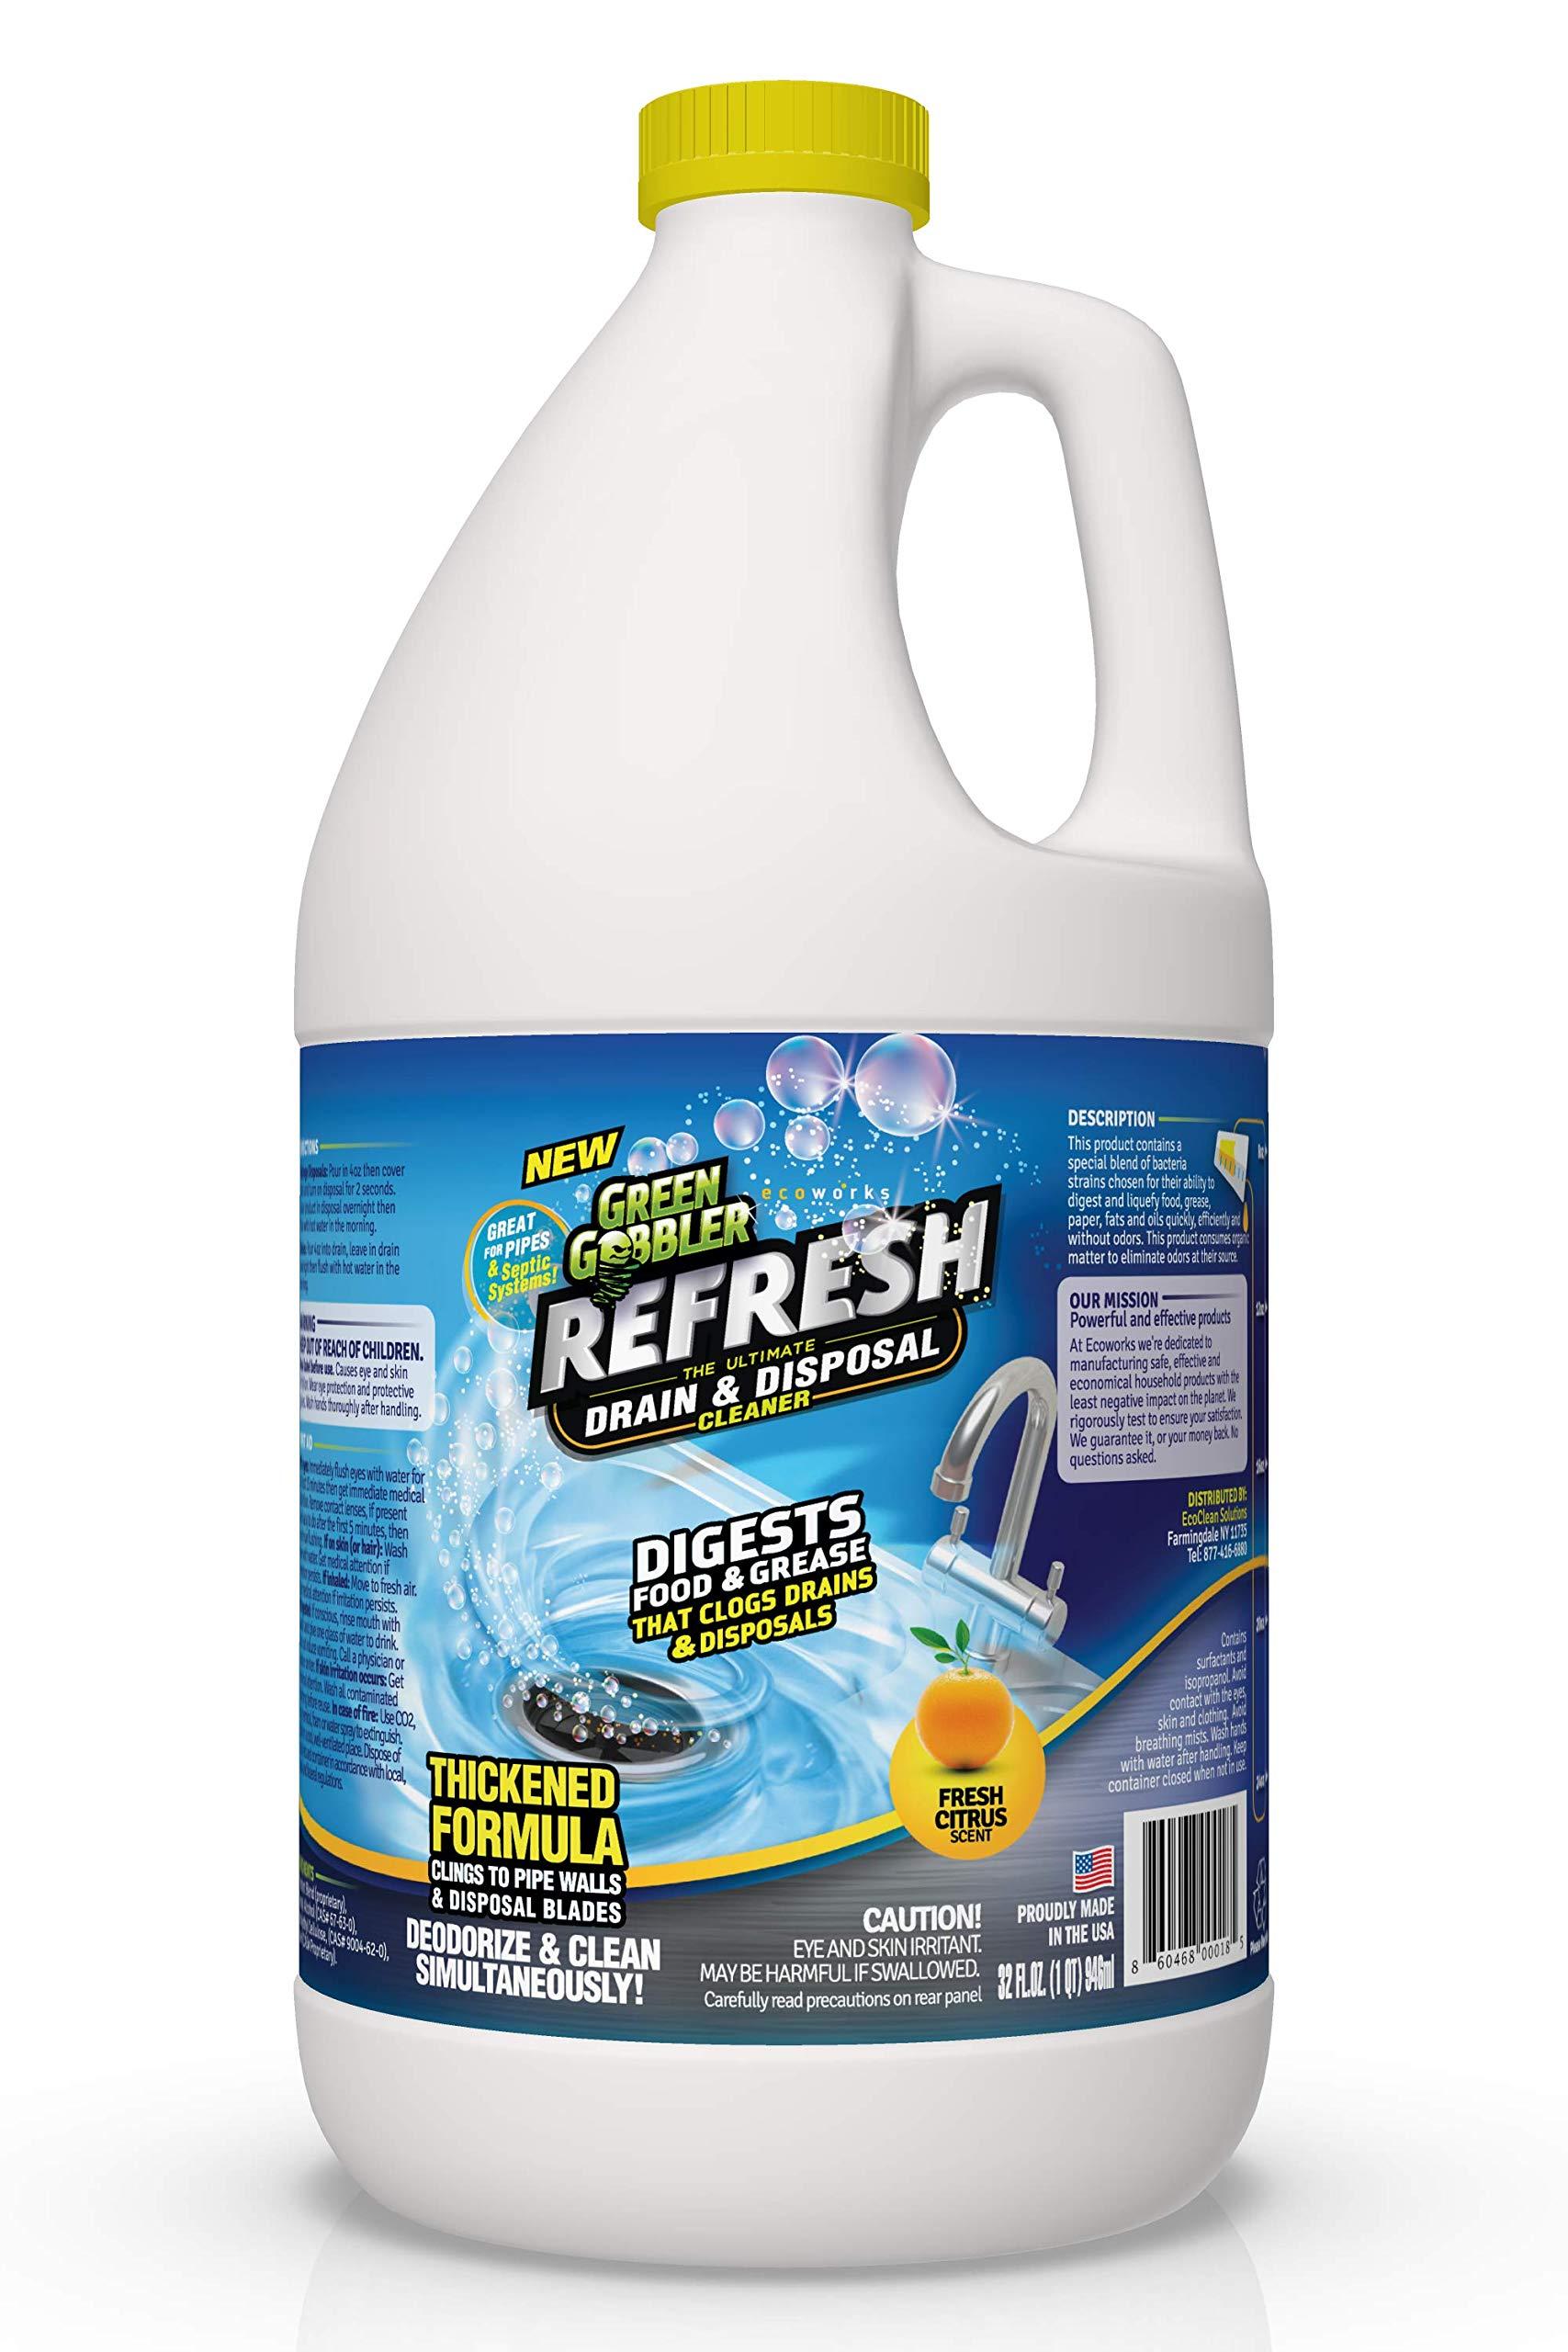 Green Gobbler ''Refresh Garbage Disposal & Drain Cleaner & Deodorizer (1 Gallon) by Green Gobbler